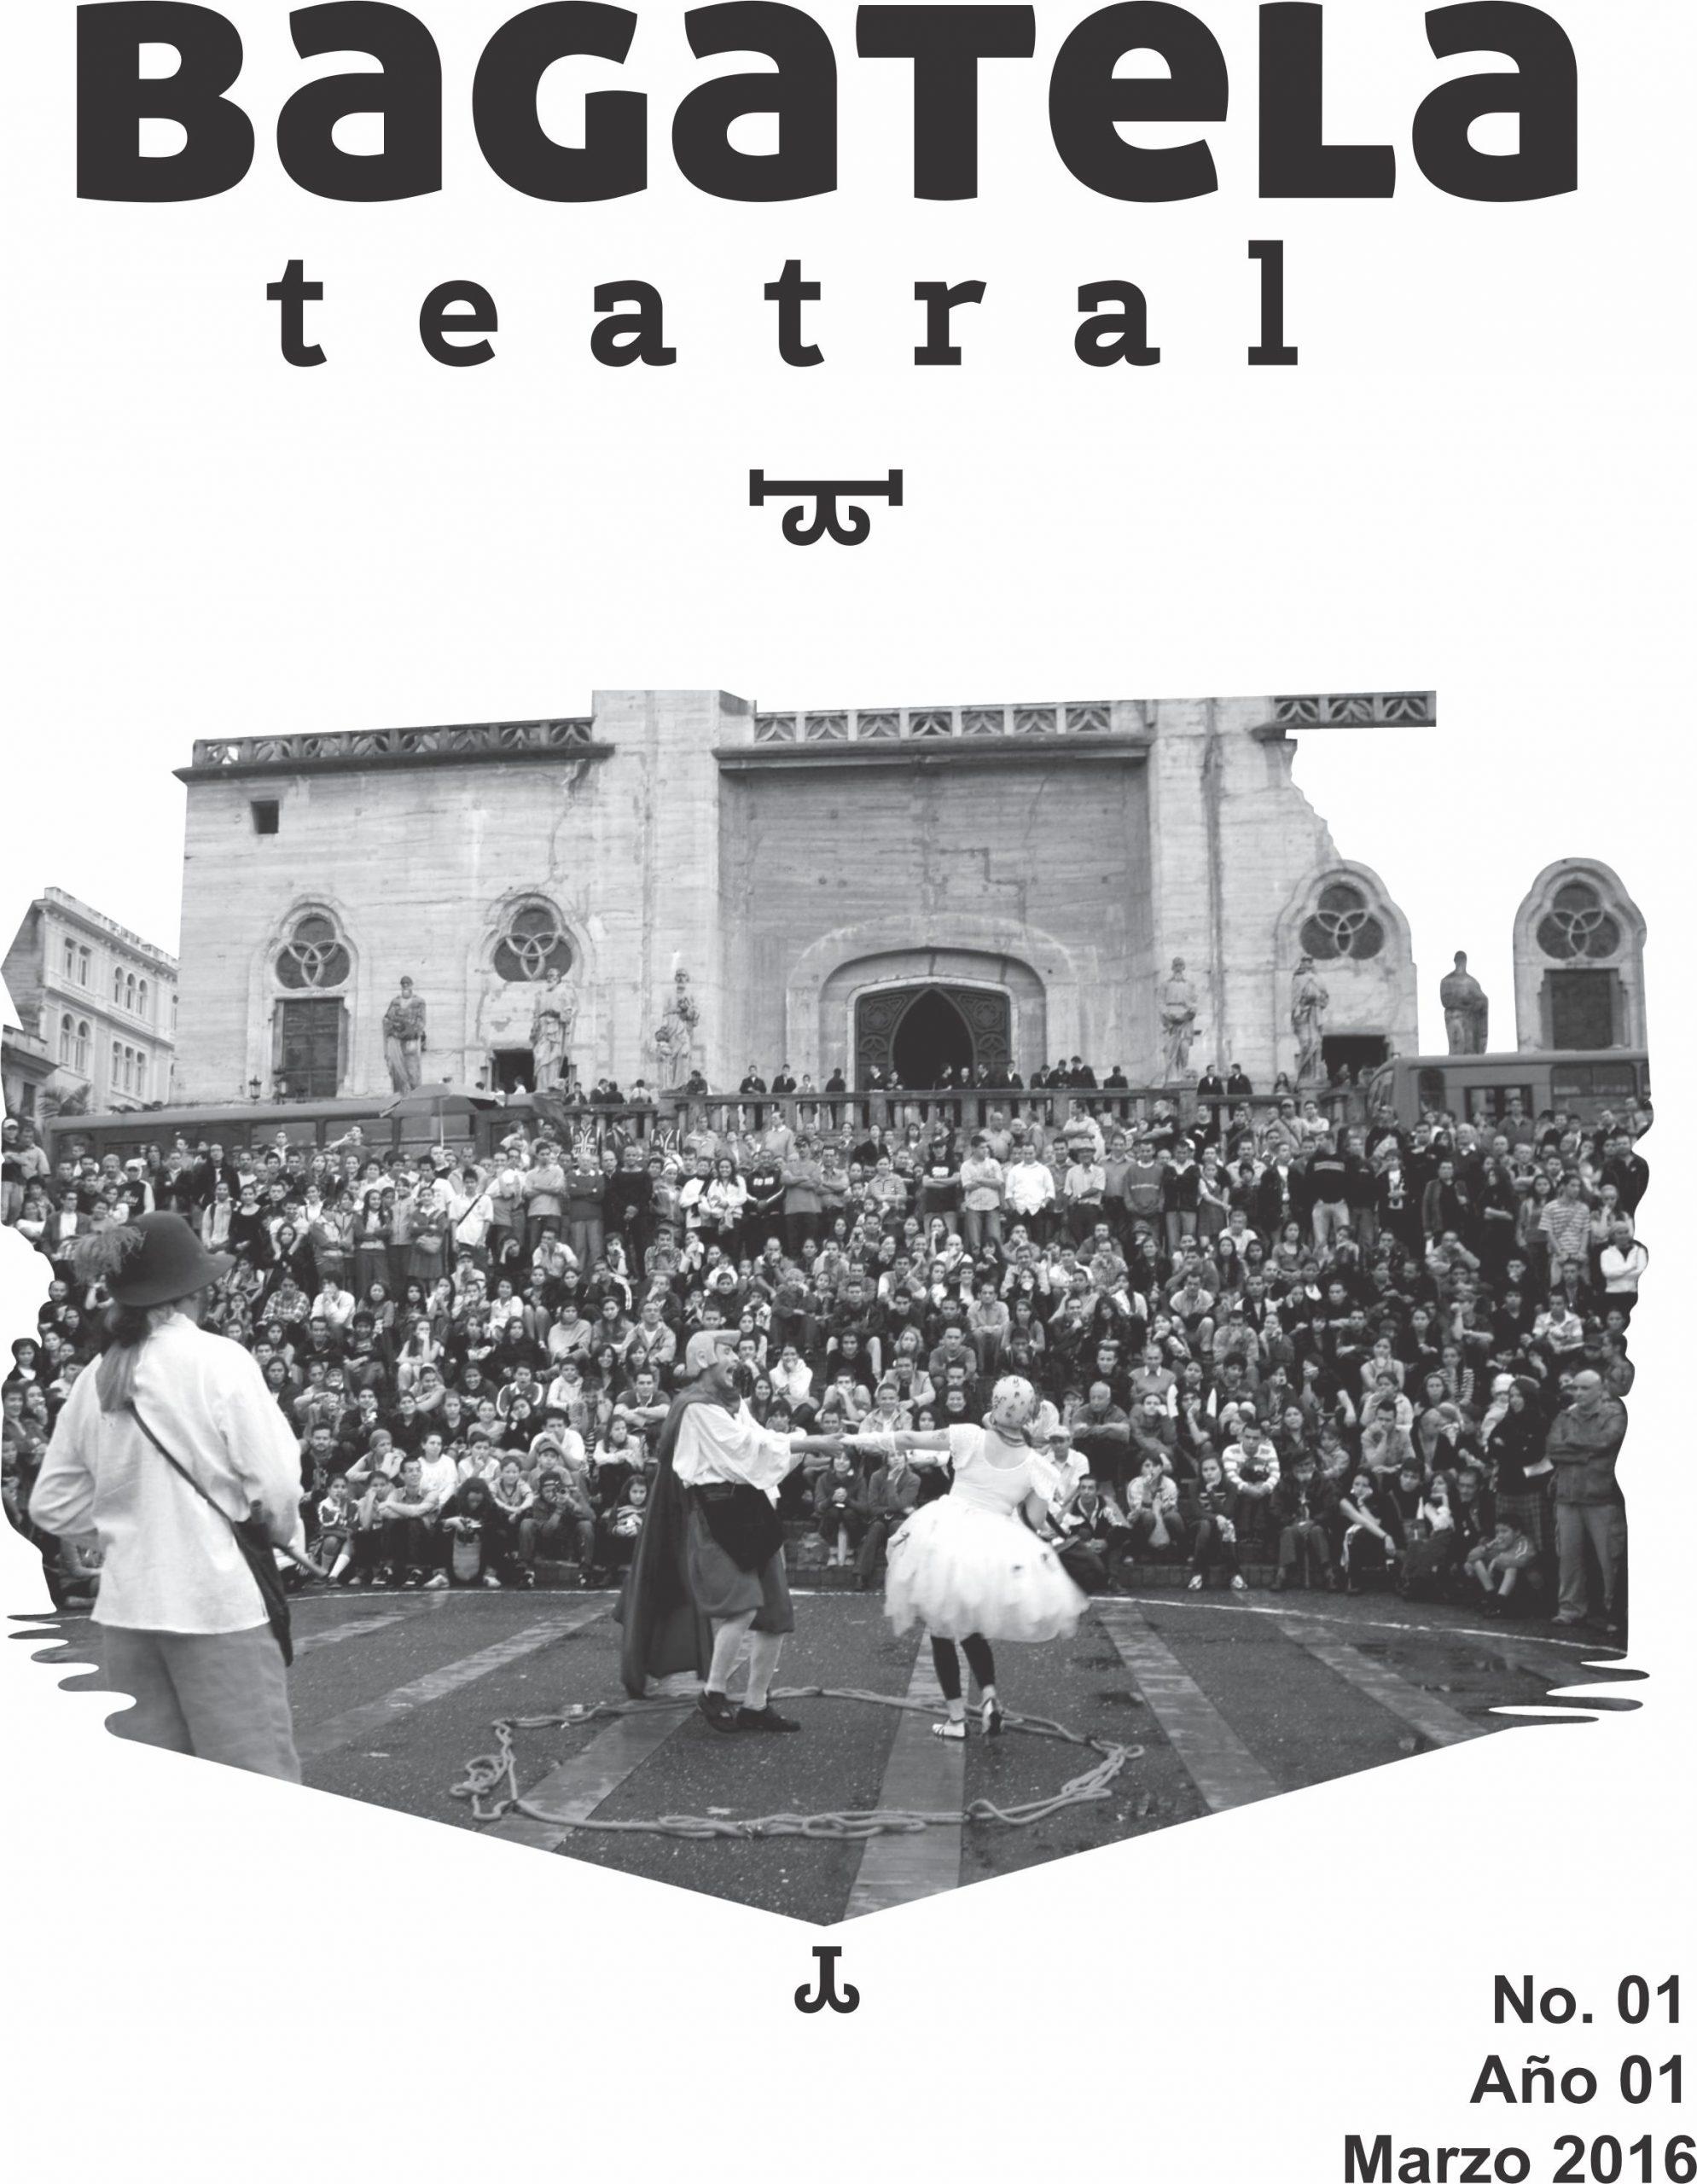 Bagatela teatral 1